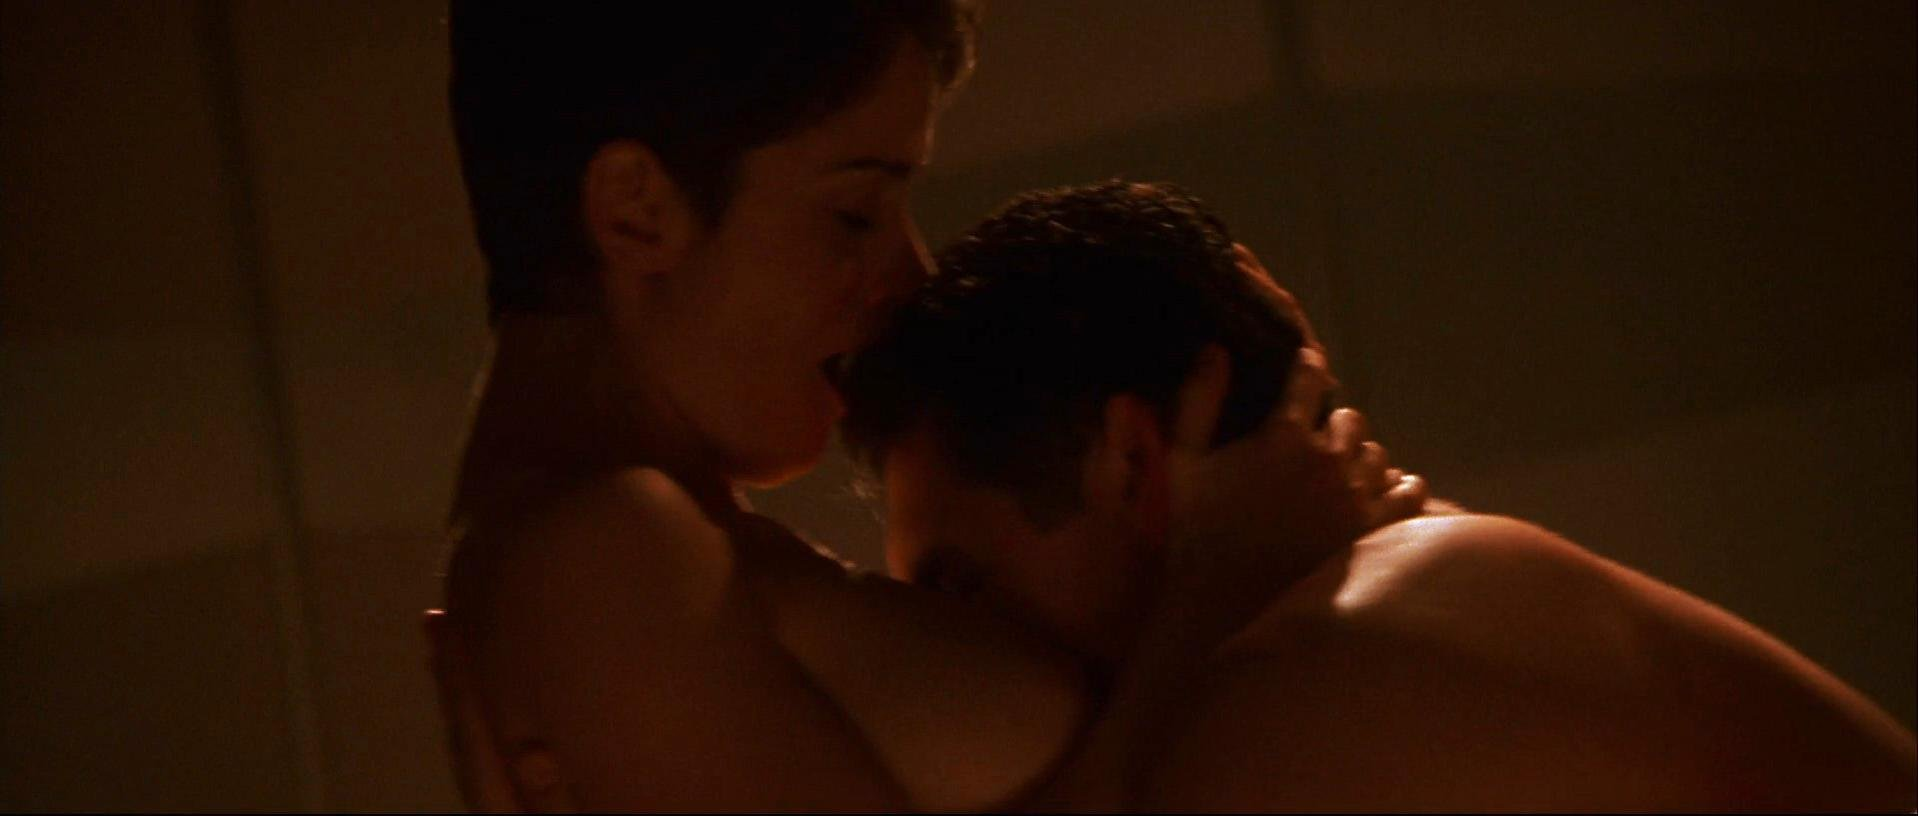 Robin tunney hot sex in supernova movie